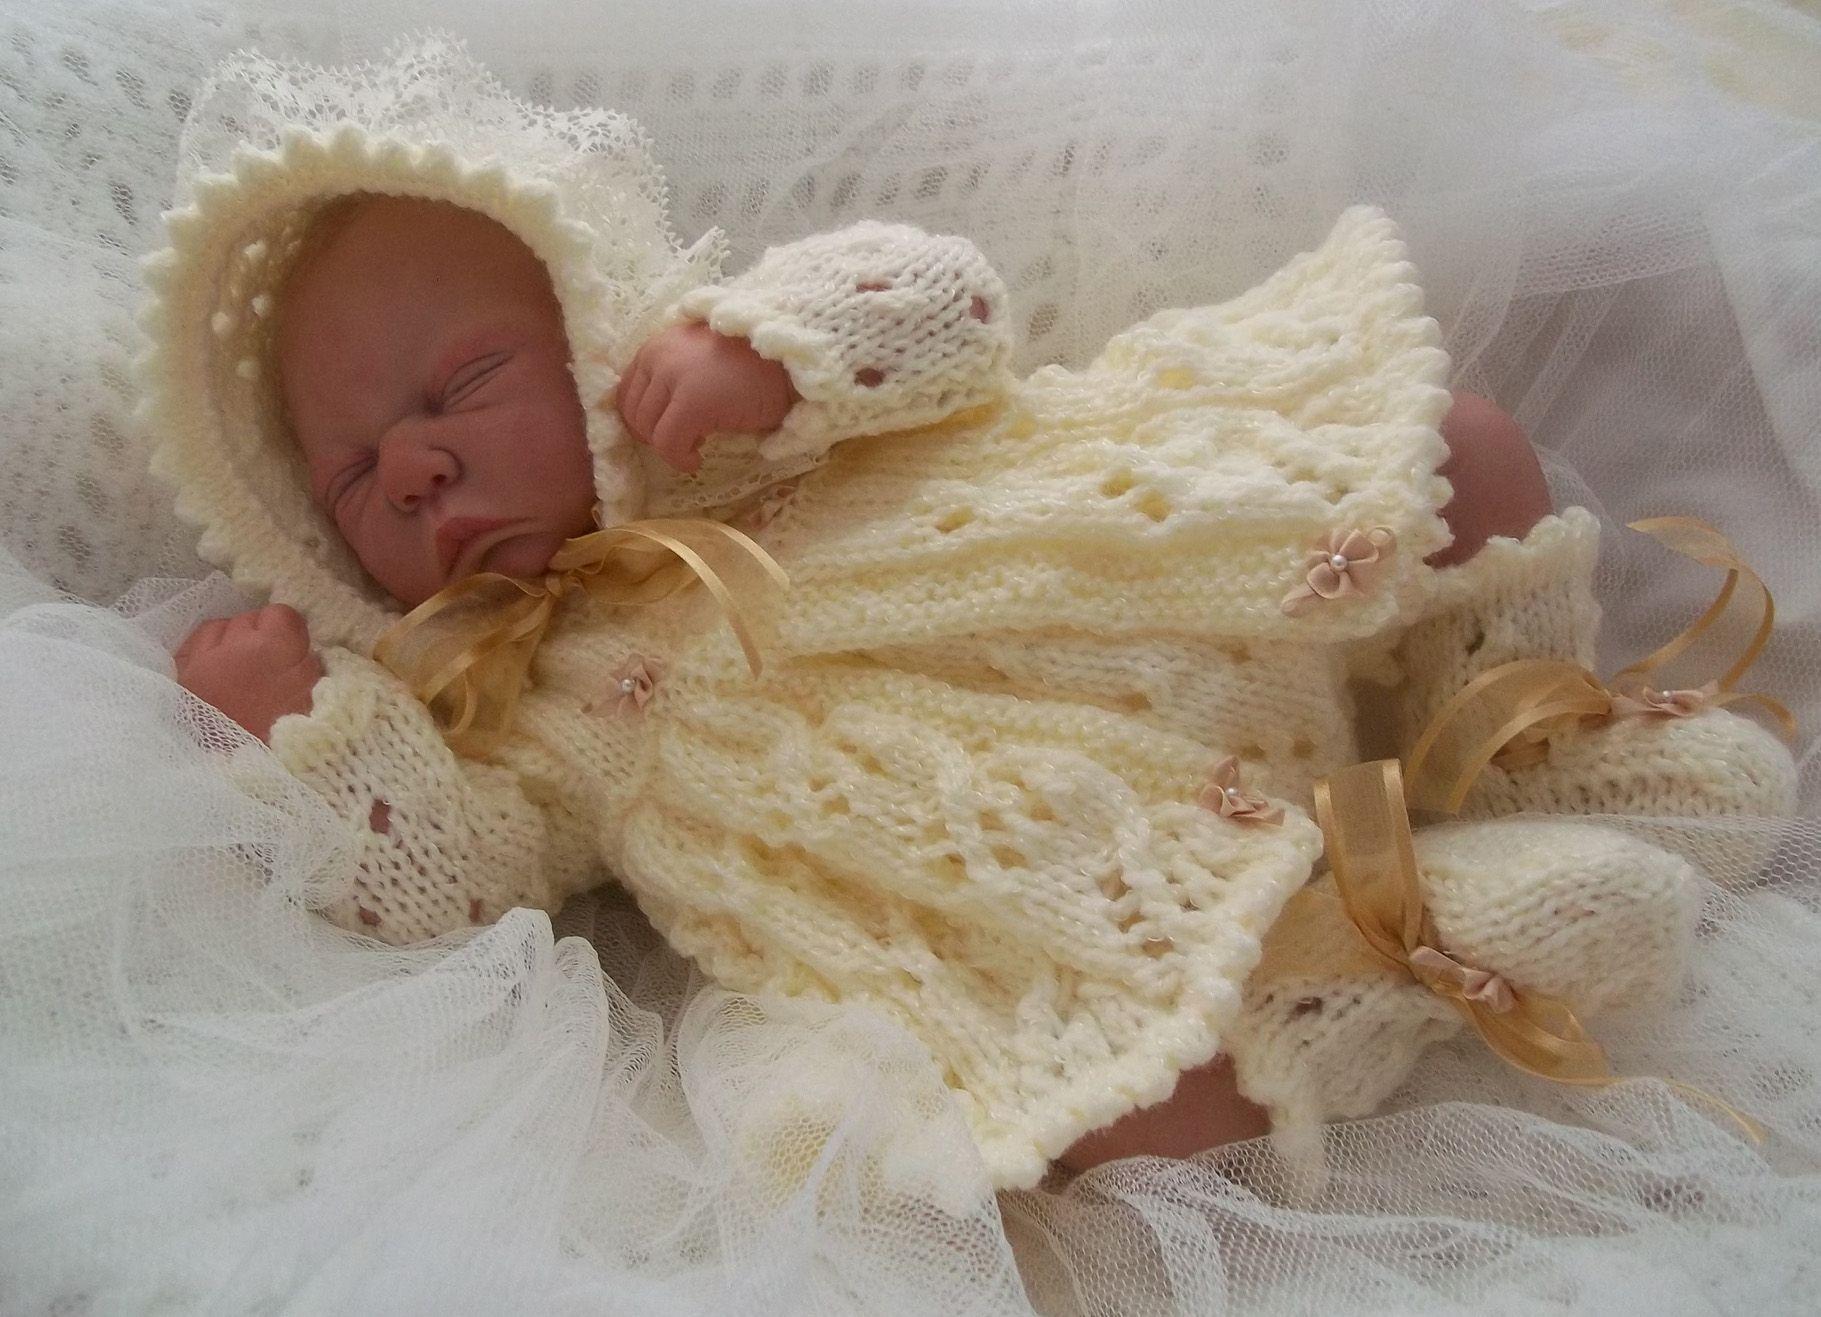 Tipeetoes designer baby knitting patterns baby outfits beanies tipeetoes designer baby knitting patterns baby outfits beanies booties bankloansurffo Images